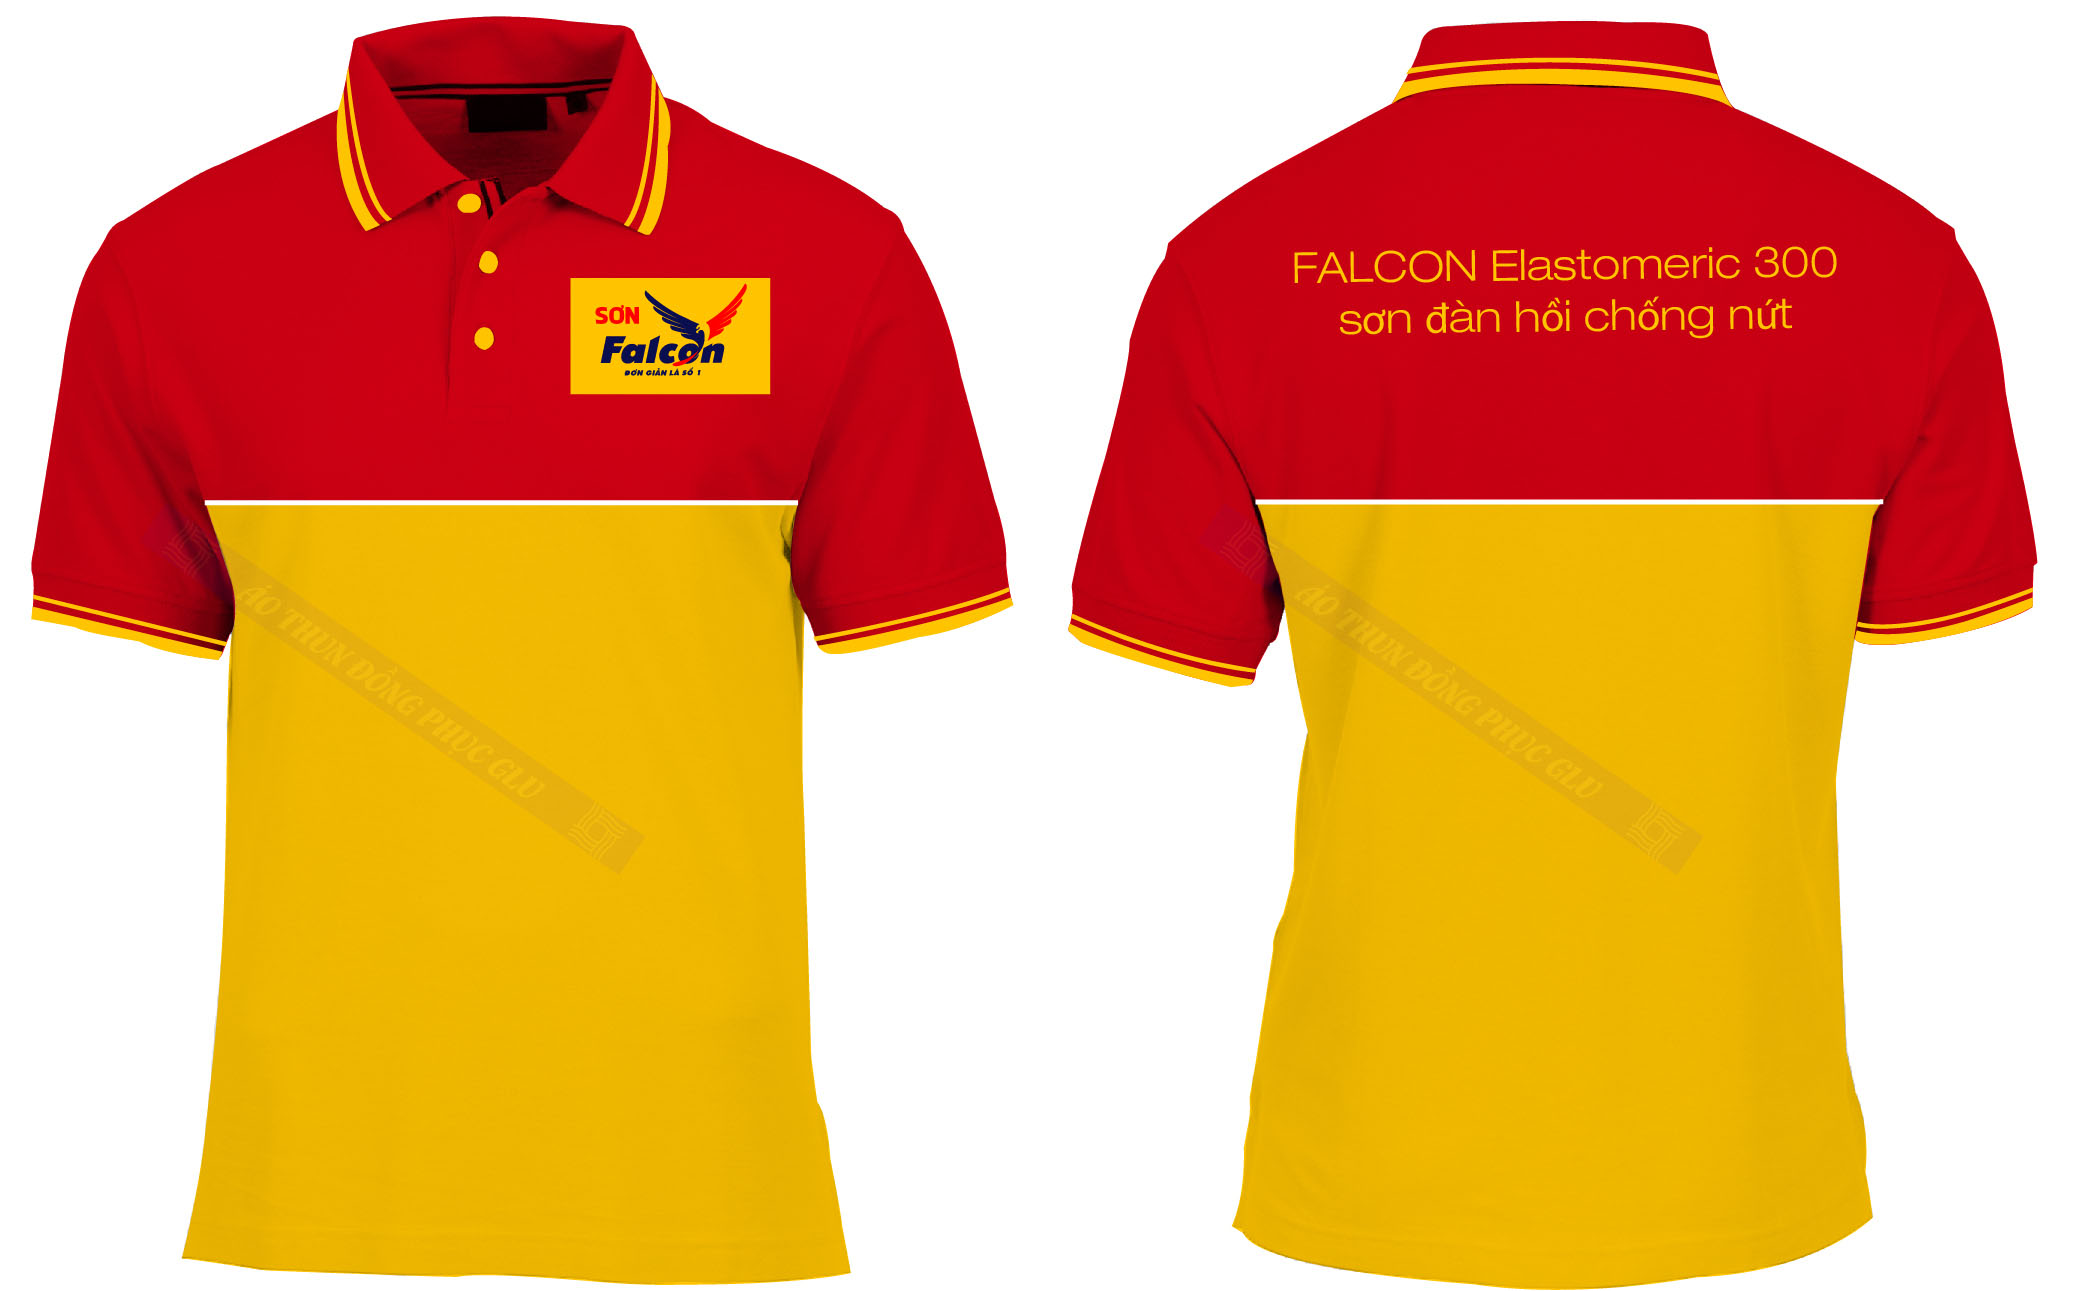 AO THUN SON FACON 2 đồng phục công ty đẹp